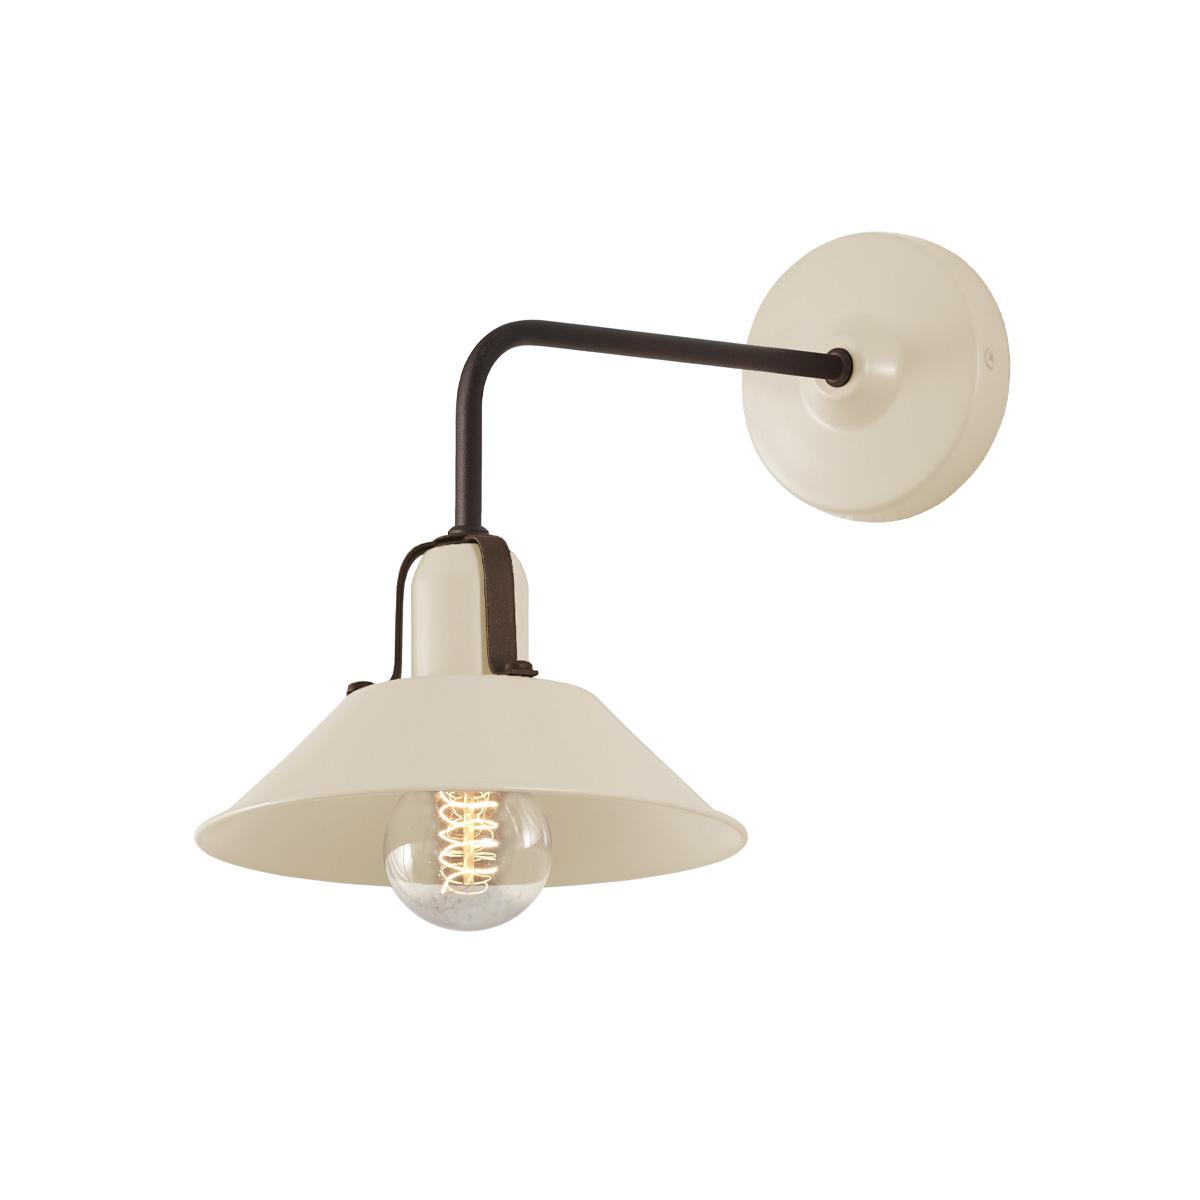 Vintage εκρού απλίκα ΜΗΛΟΣ vintage ecru wall lamp